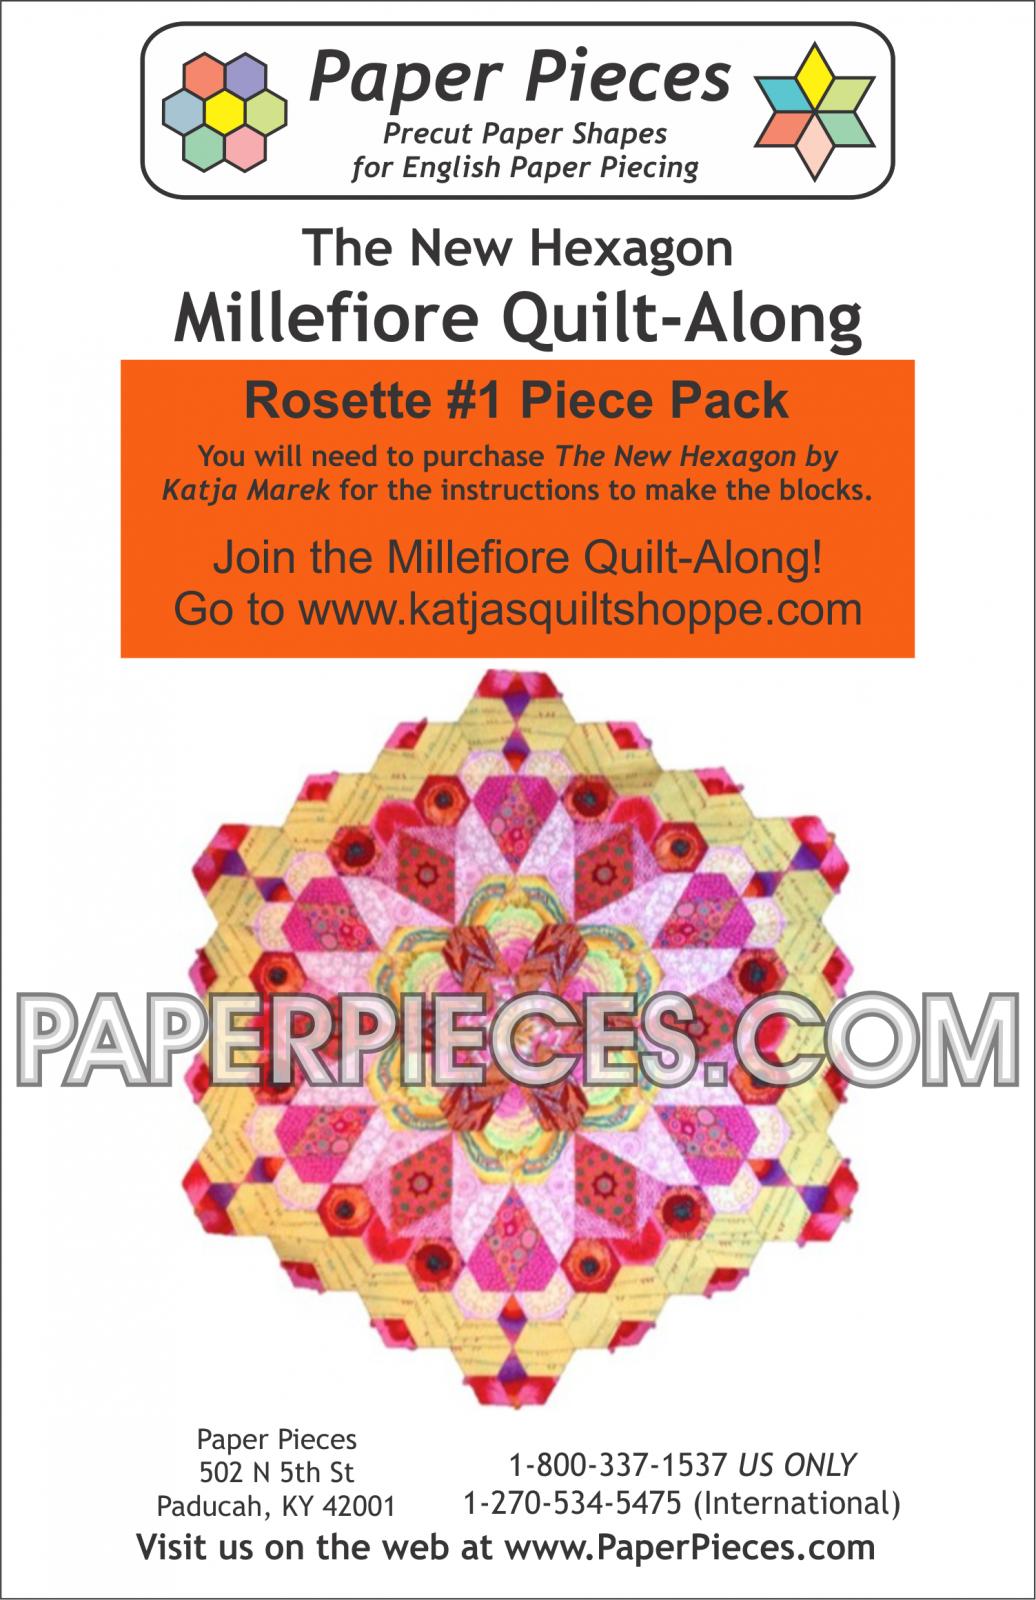 Katja Mareks' Millefiore Quiltalong Paper Piece Packs